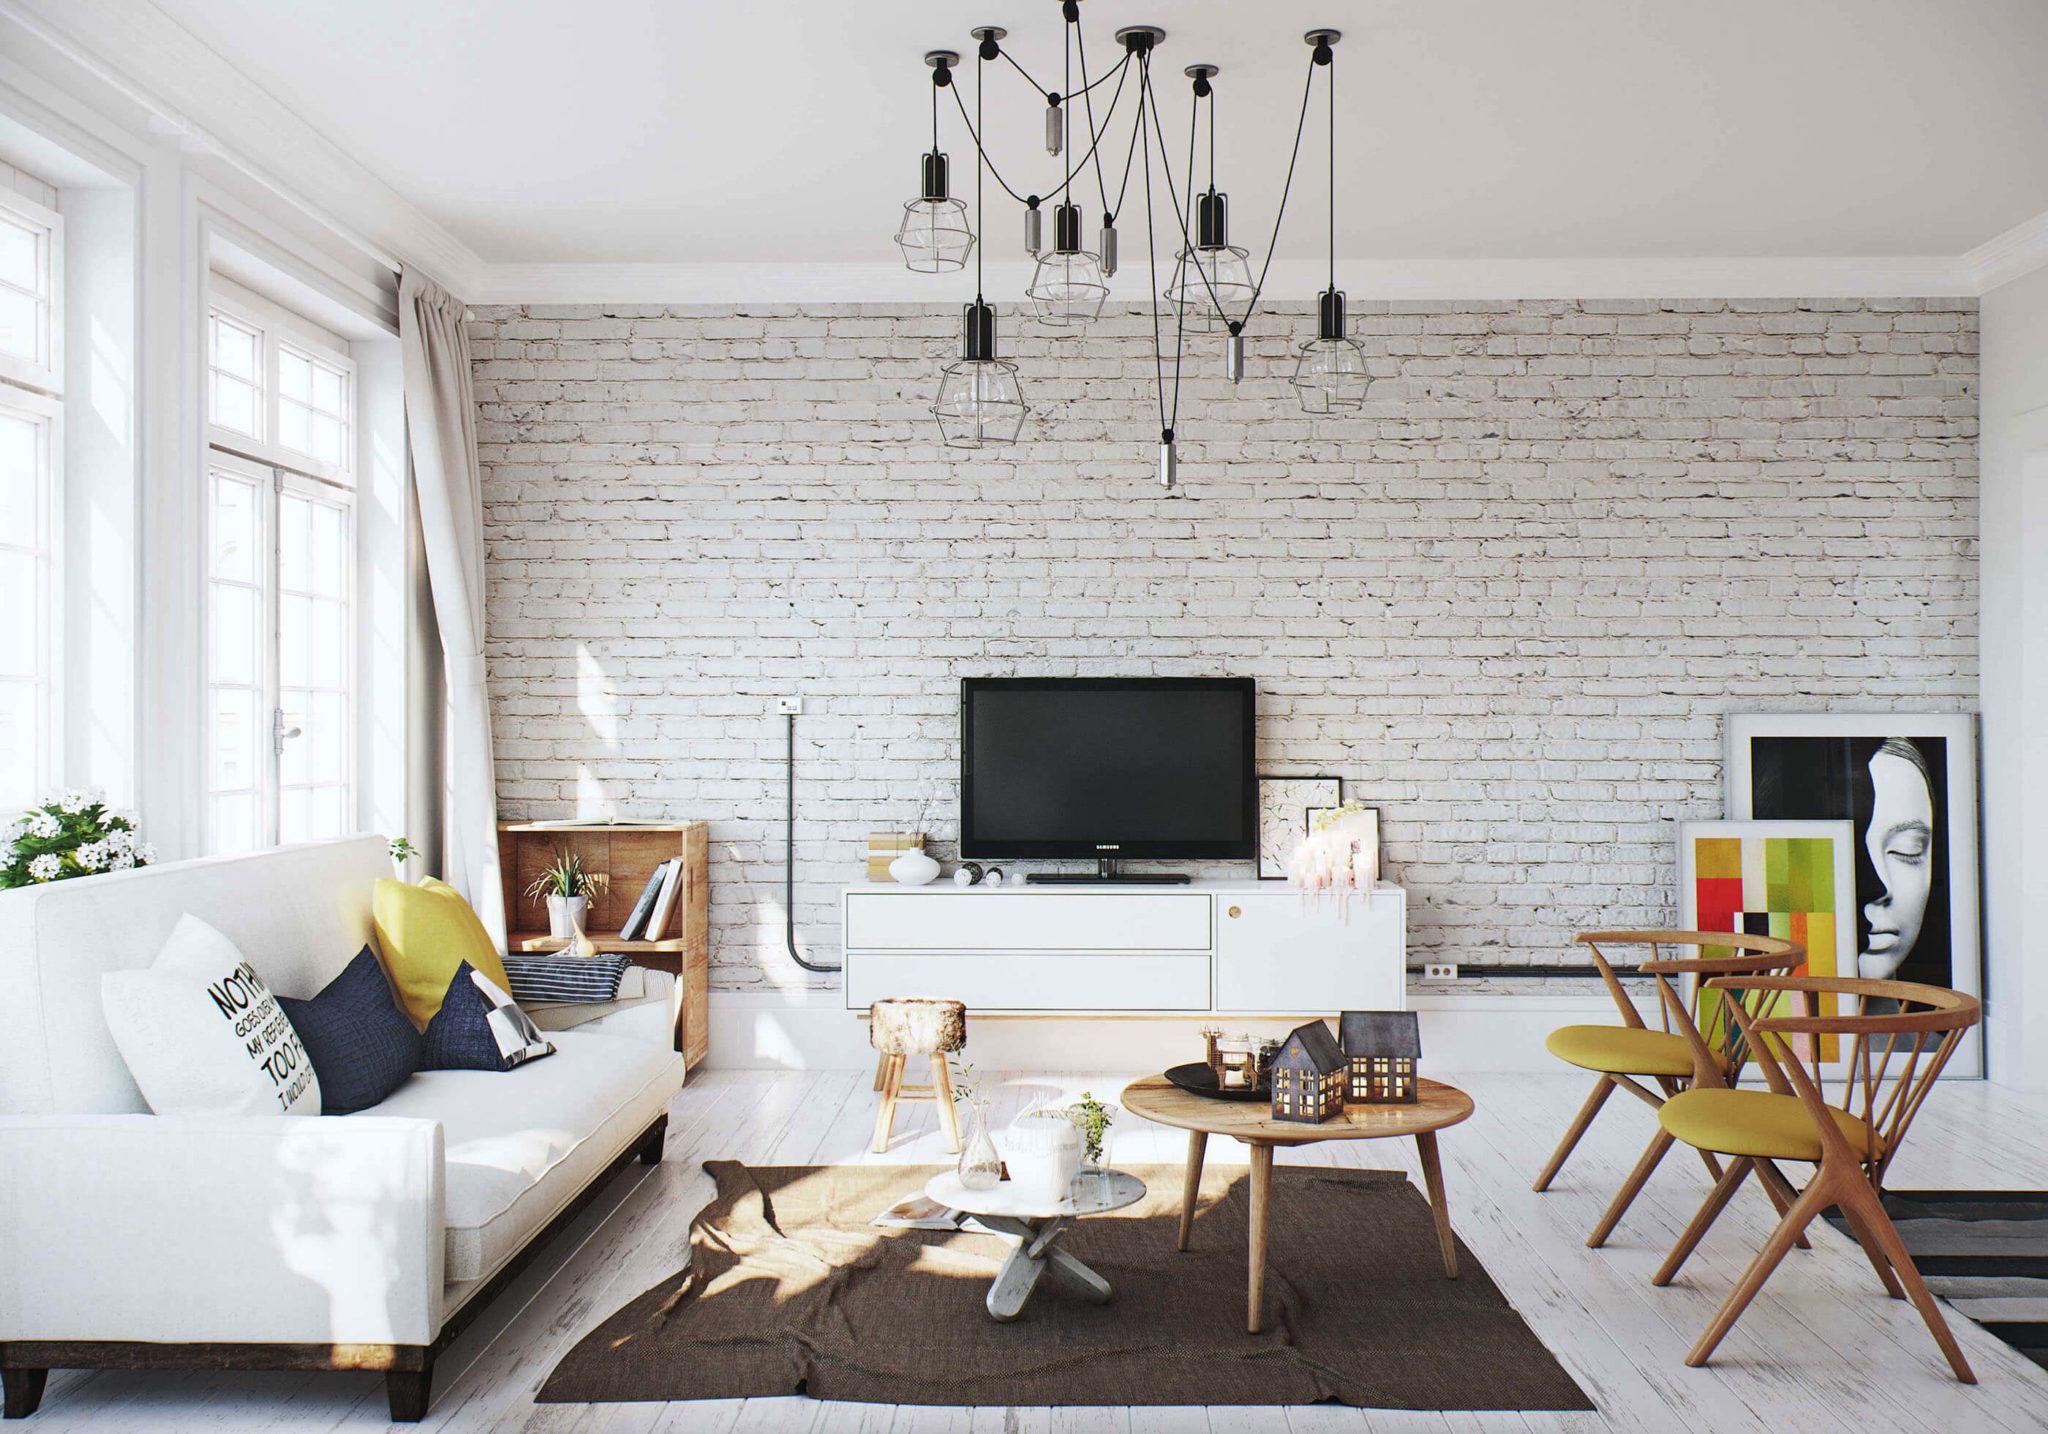 How to เปลี่ยนห้องนั่งเล่นเป็นสไตล์ Nordic ทำเองได้ ง่ายนิดเดียว! 18 - Nordic